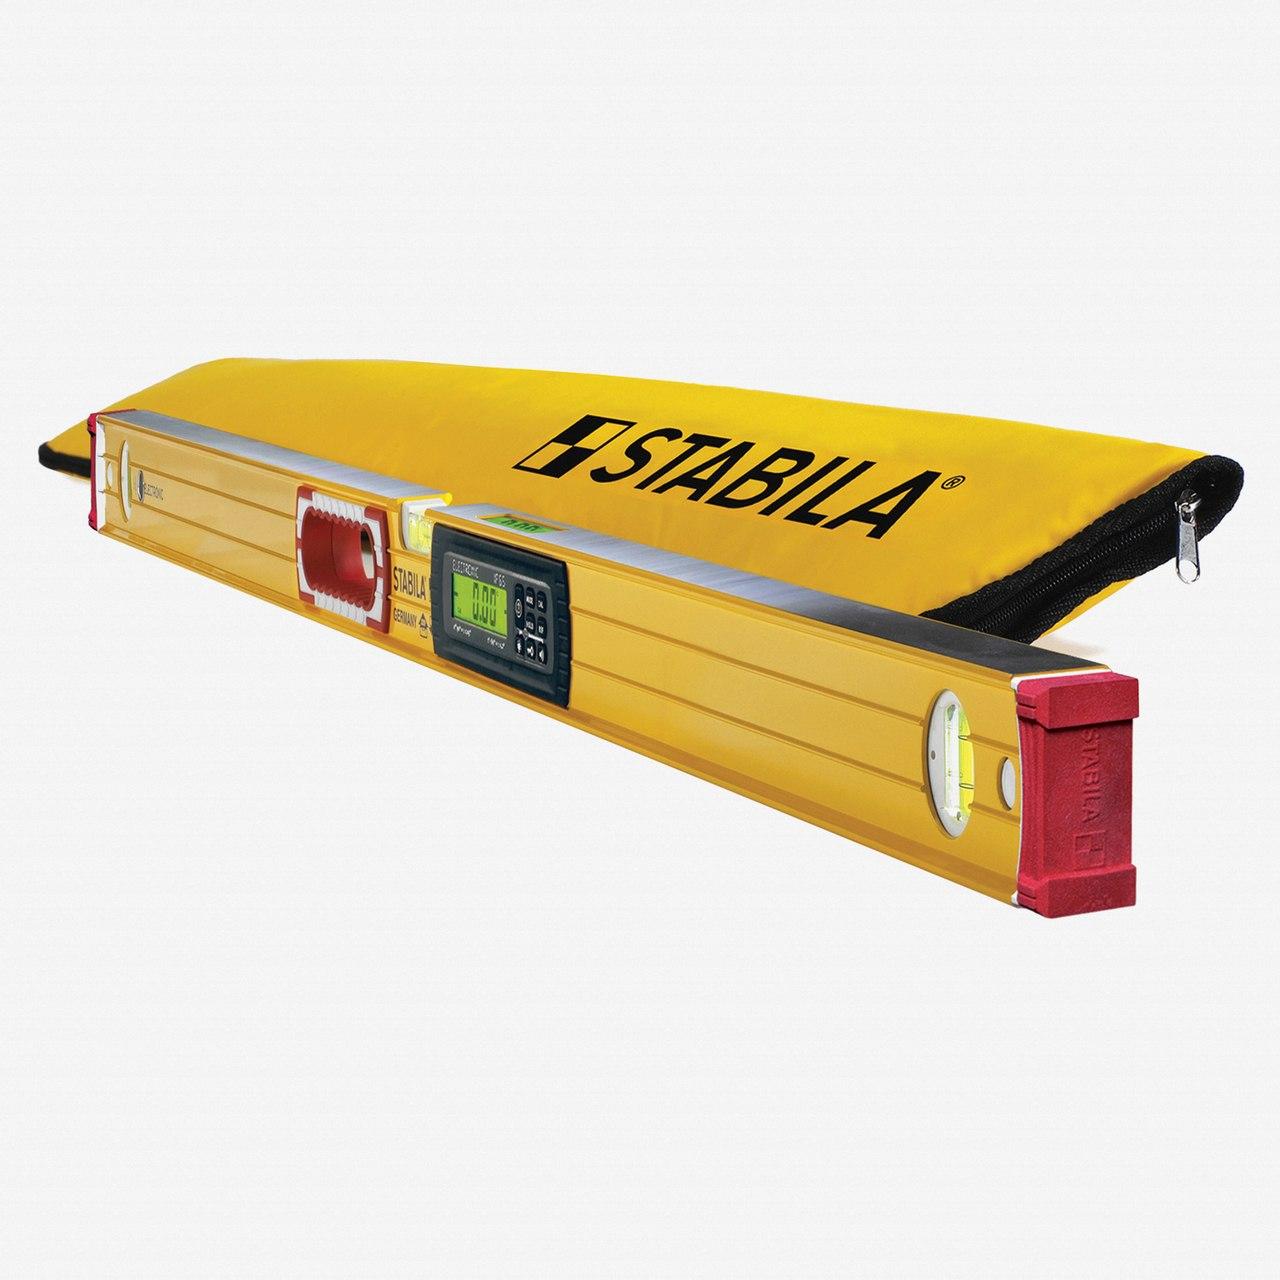 Stabila TECH 48 Inch Aluminum 5 Mode Digital Electronic Level w  Carrying Case 36548 by Stabila